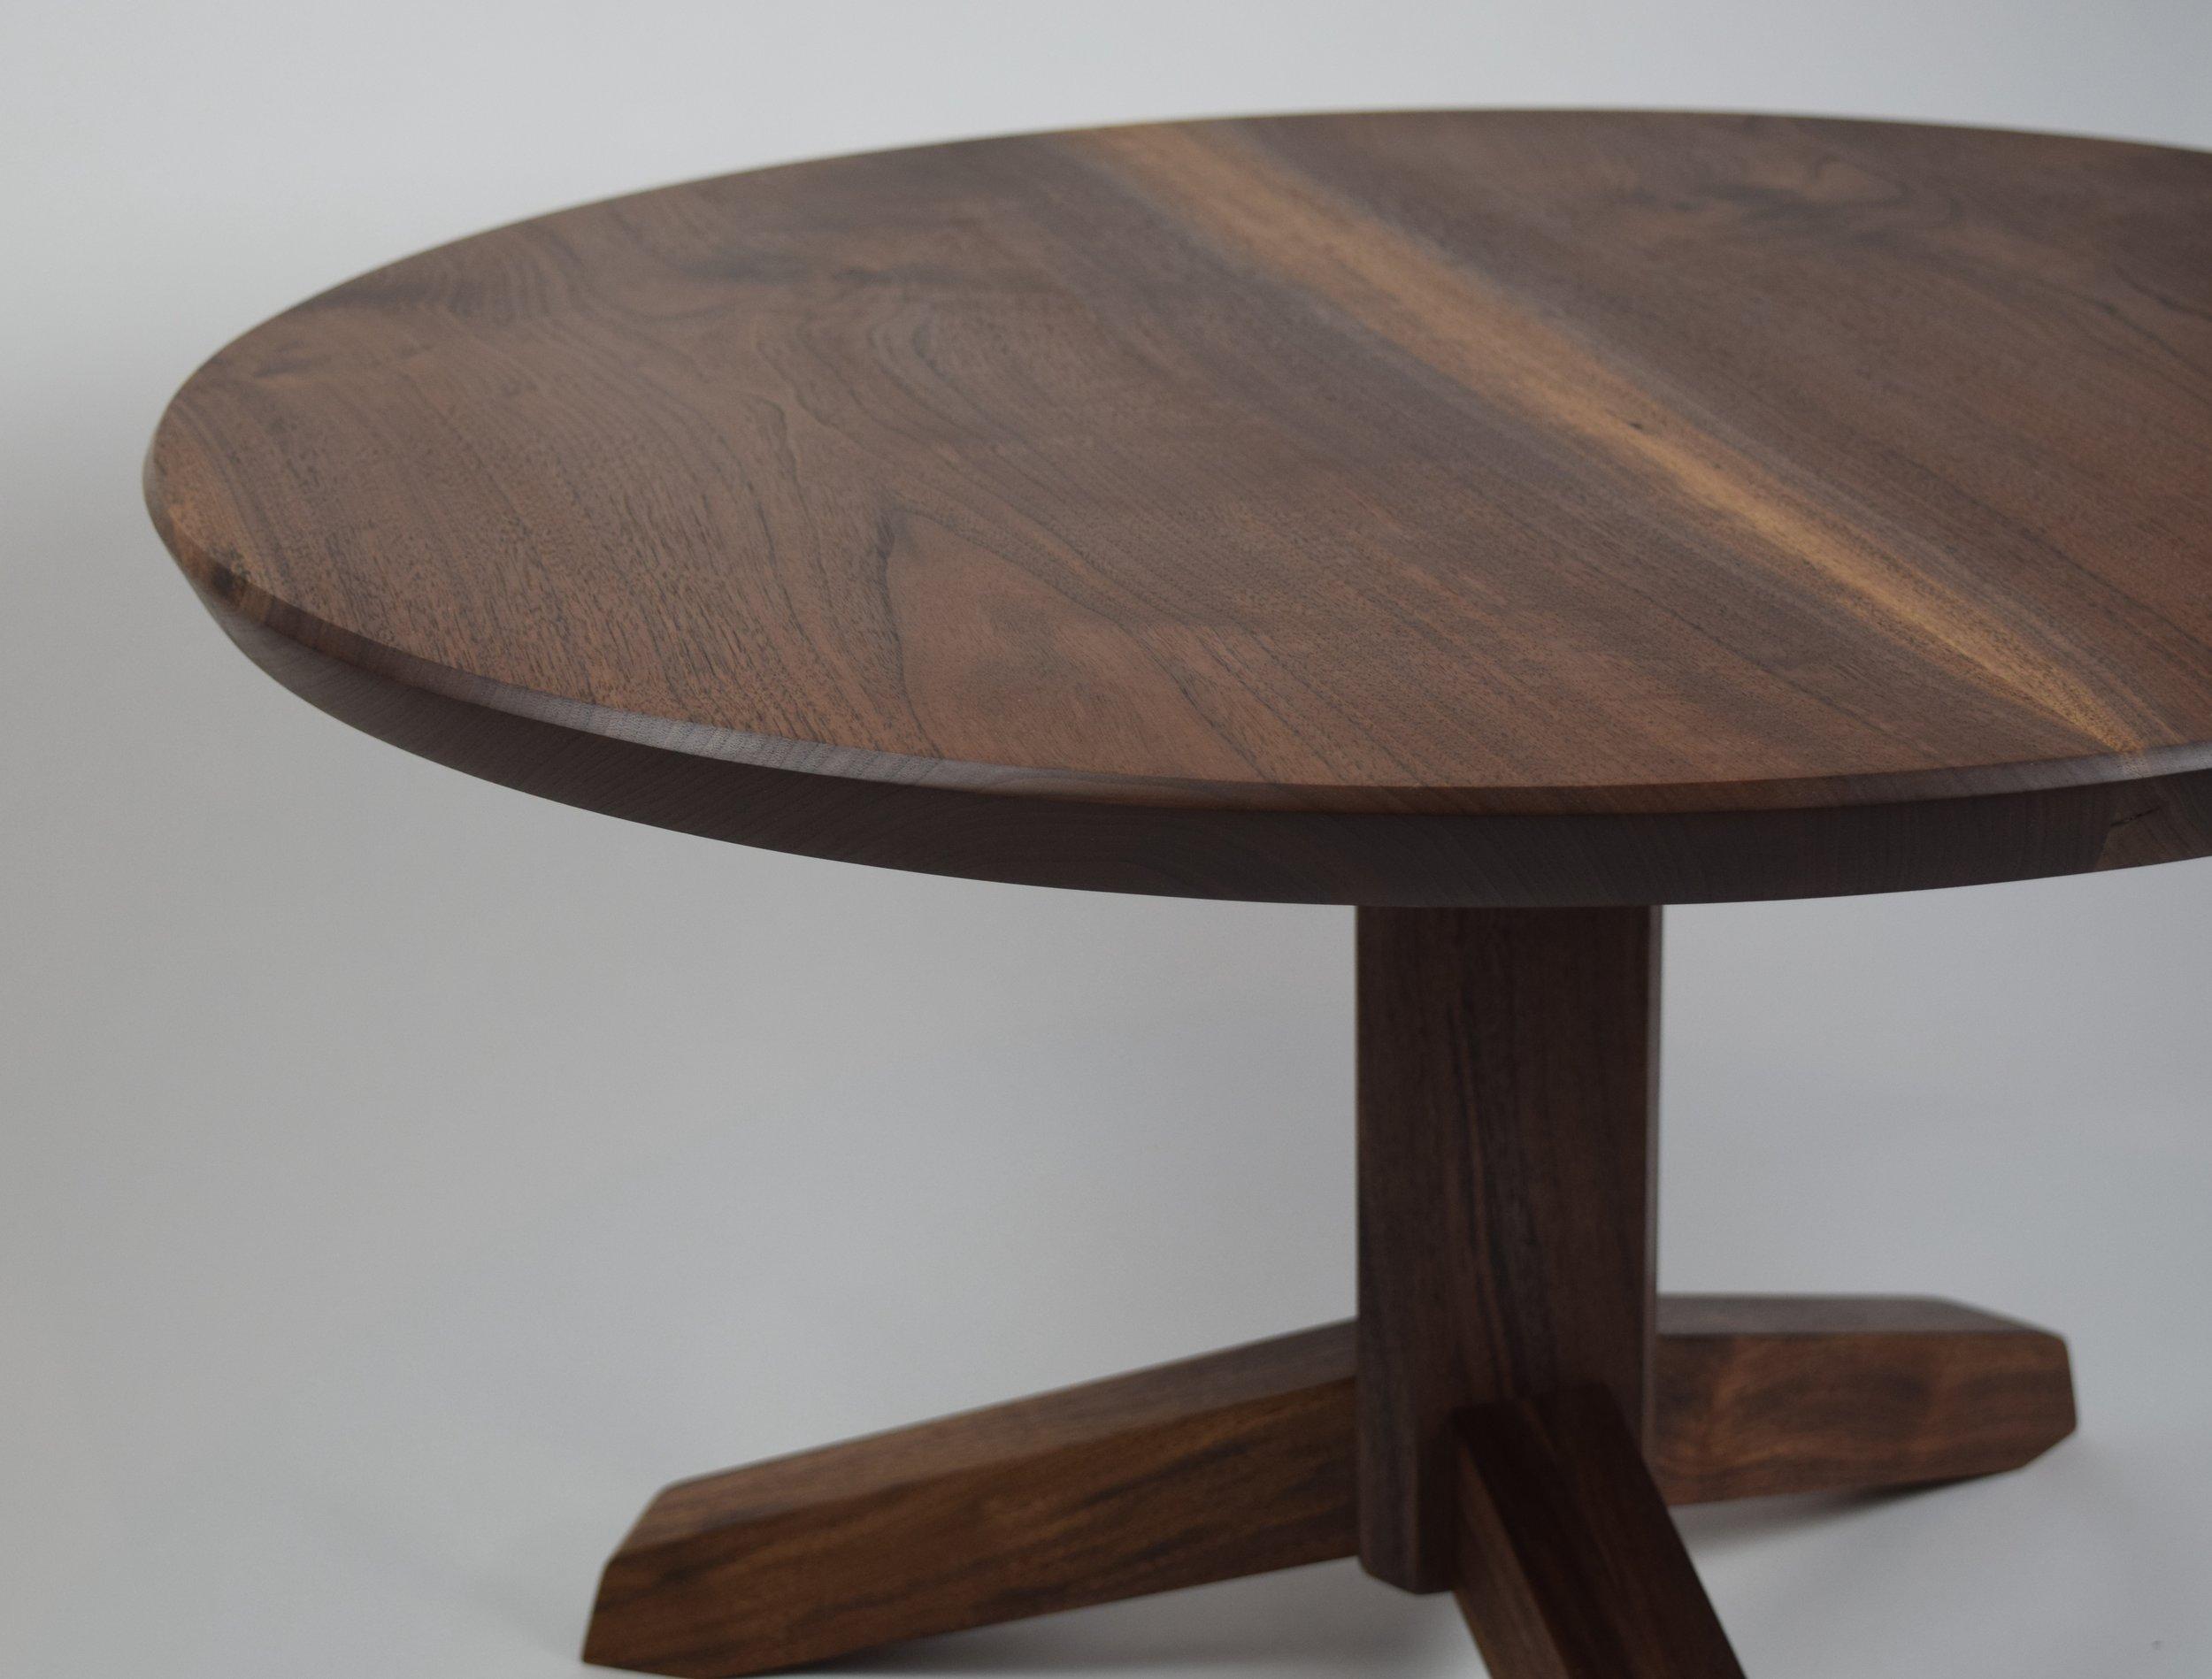 Modern Pedestal Coffee Table - Oregon Black Walnut